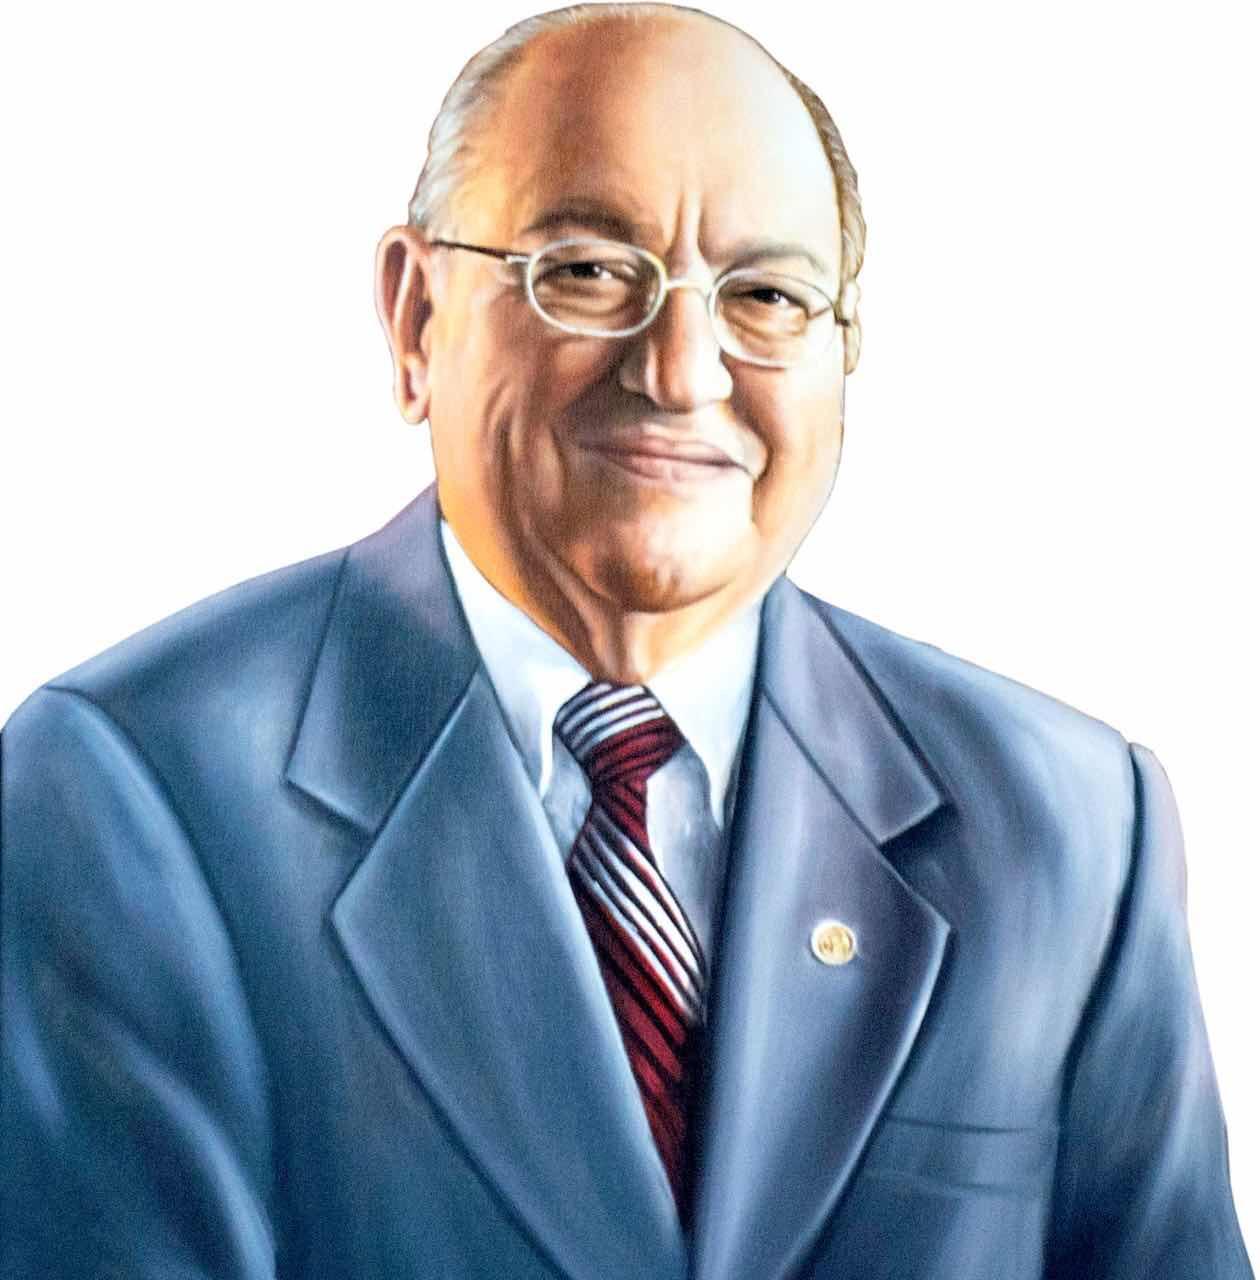 Fallece fundador de Autoridad Portuaria Dominicana, Don Juan Periche Vidal